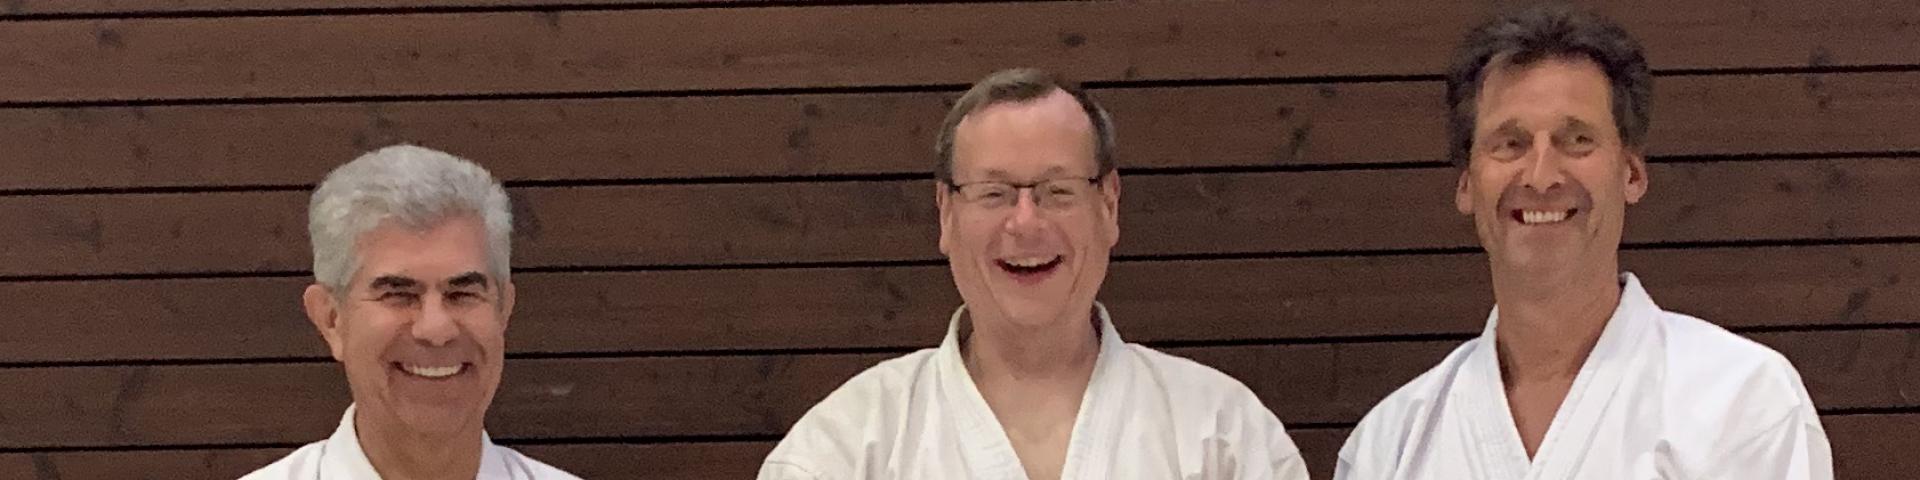 Karate-Perfekt.de  空手 - パーフェクト